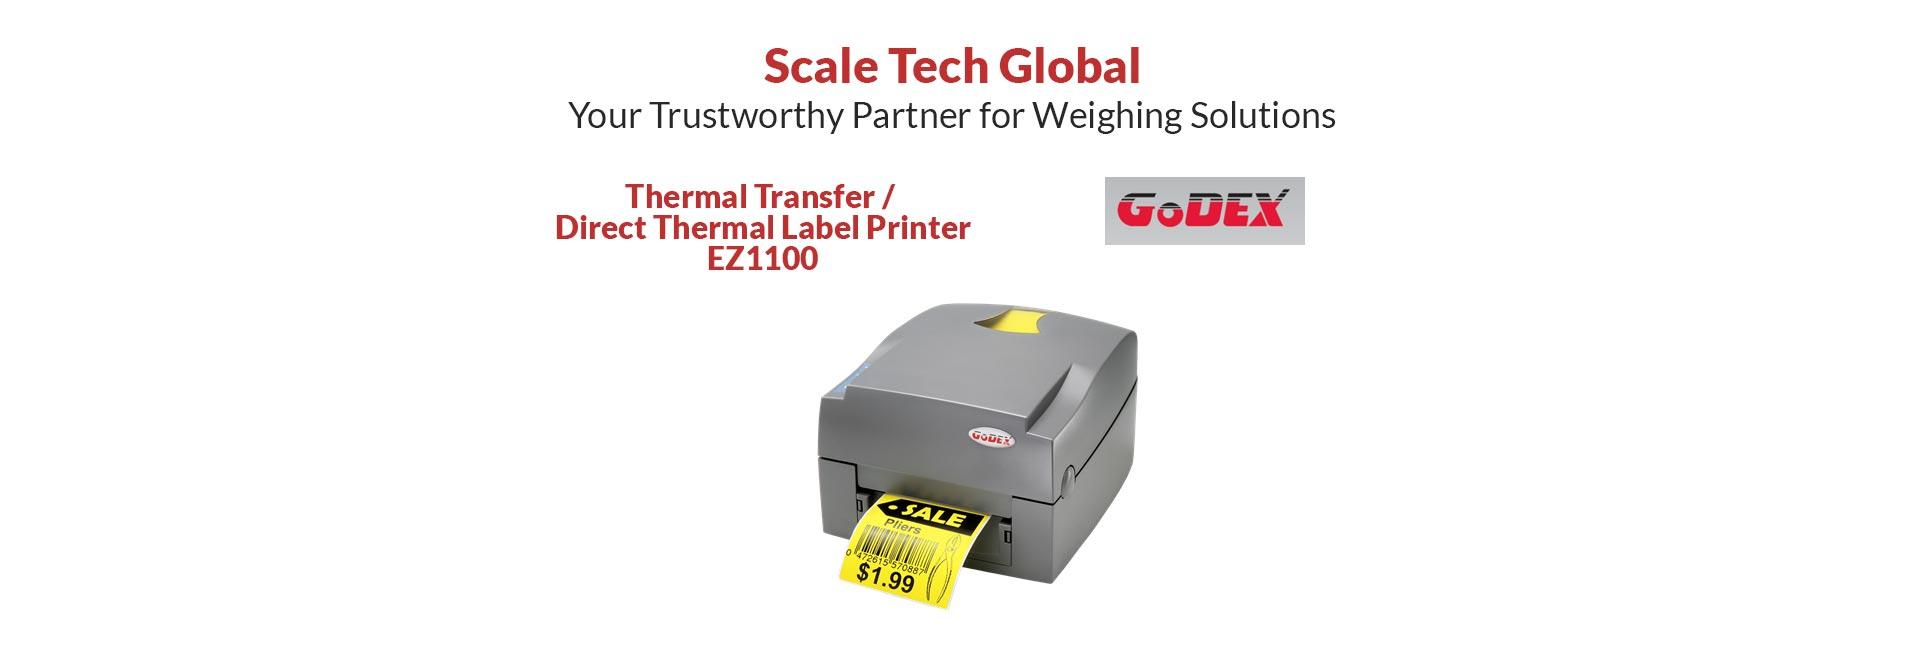 slider-image-EZ1100-direct-transfer-thermal-printer